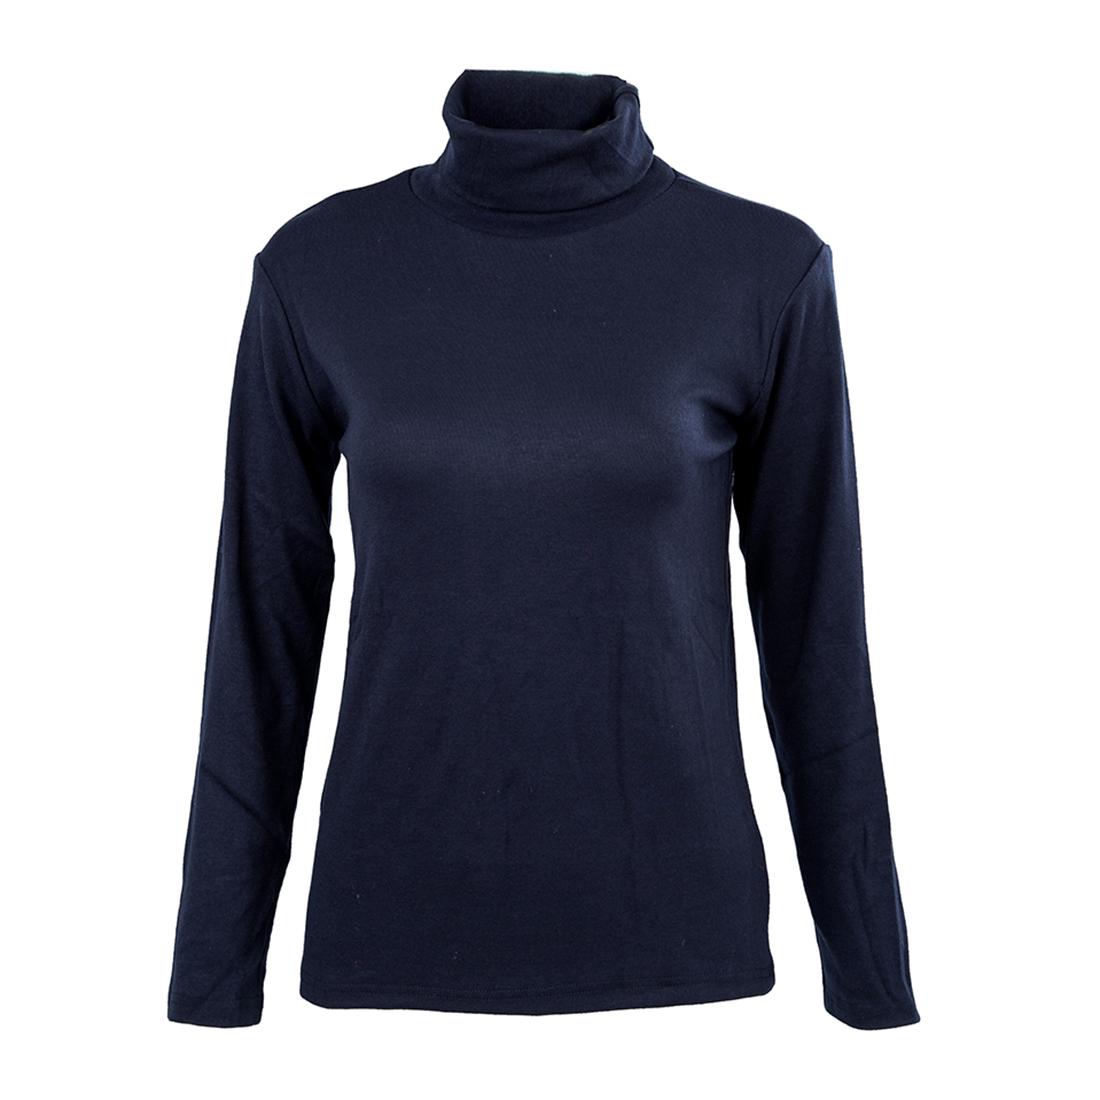 Sweater Pk 21